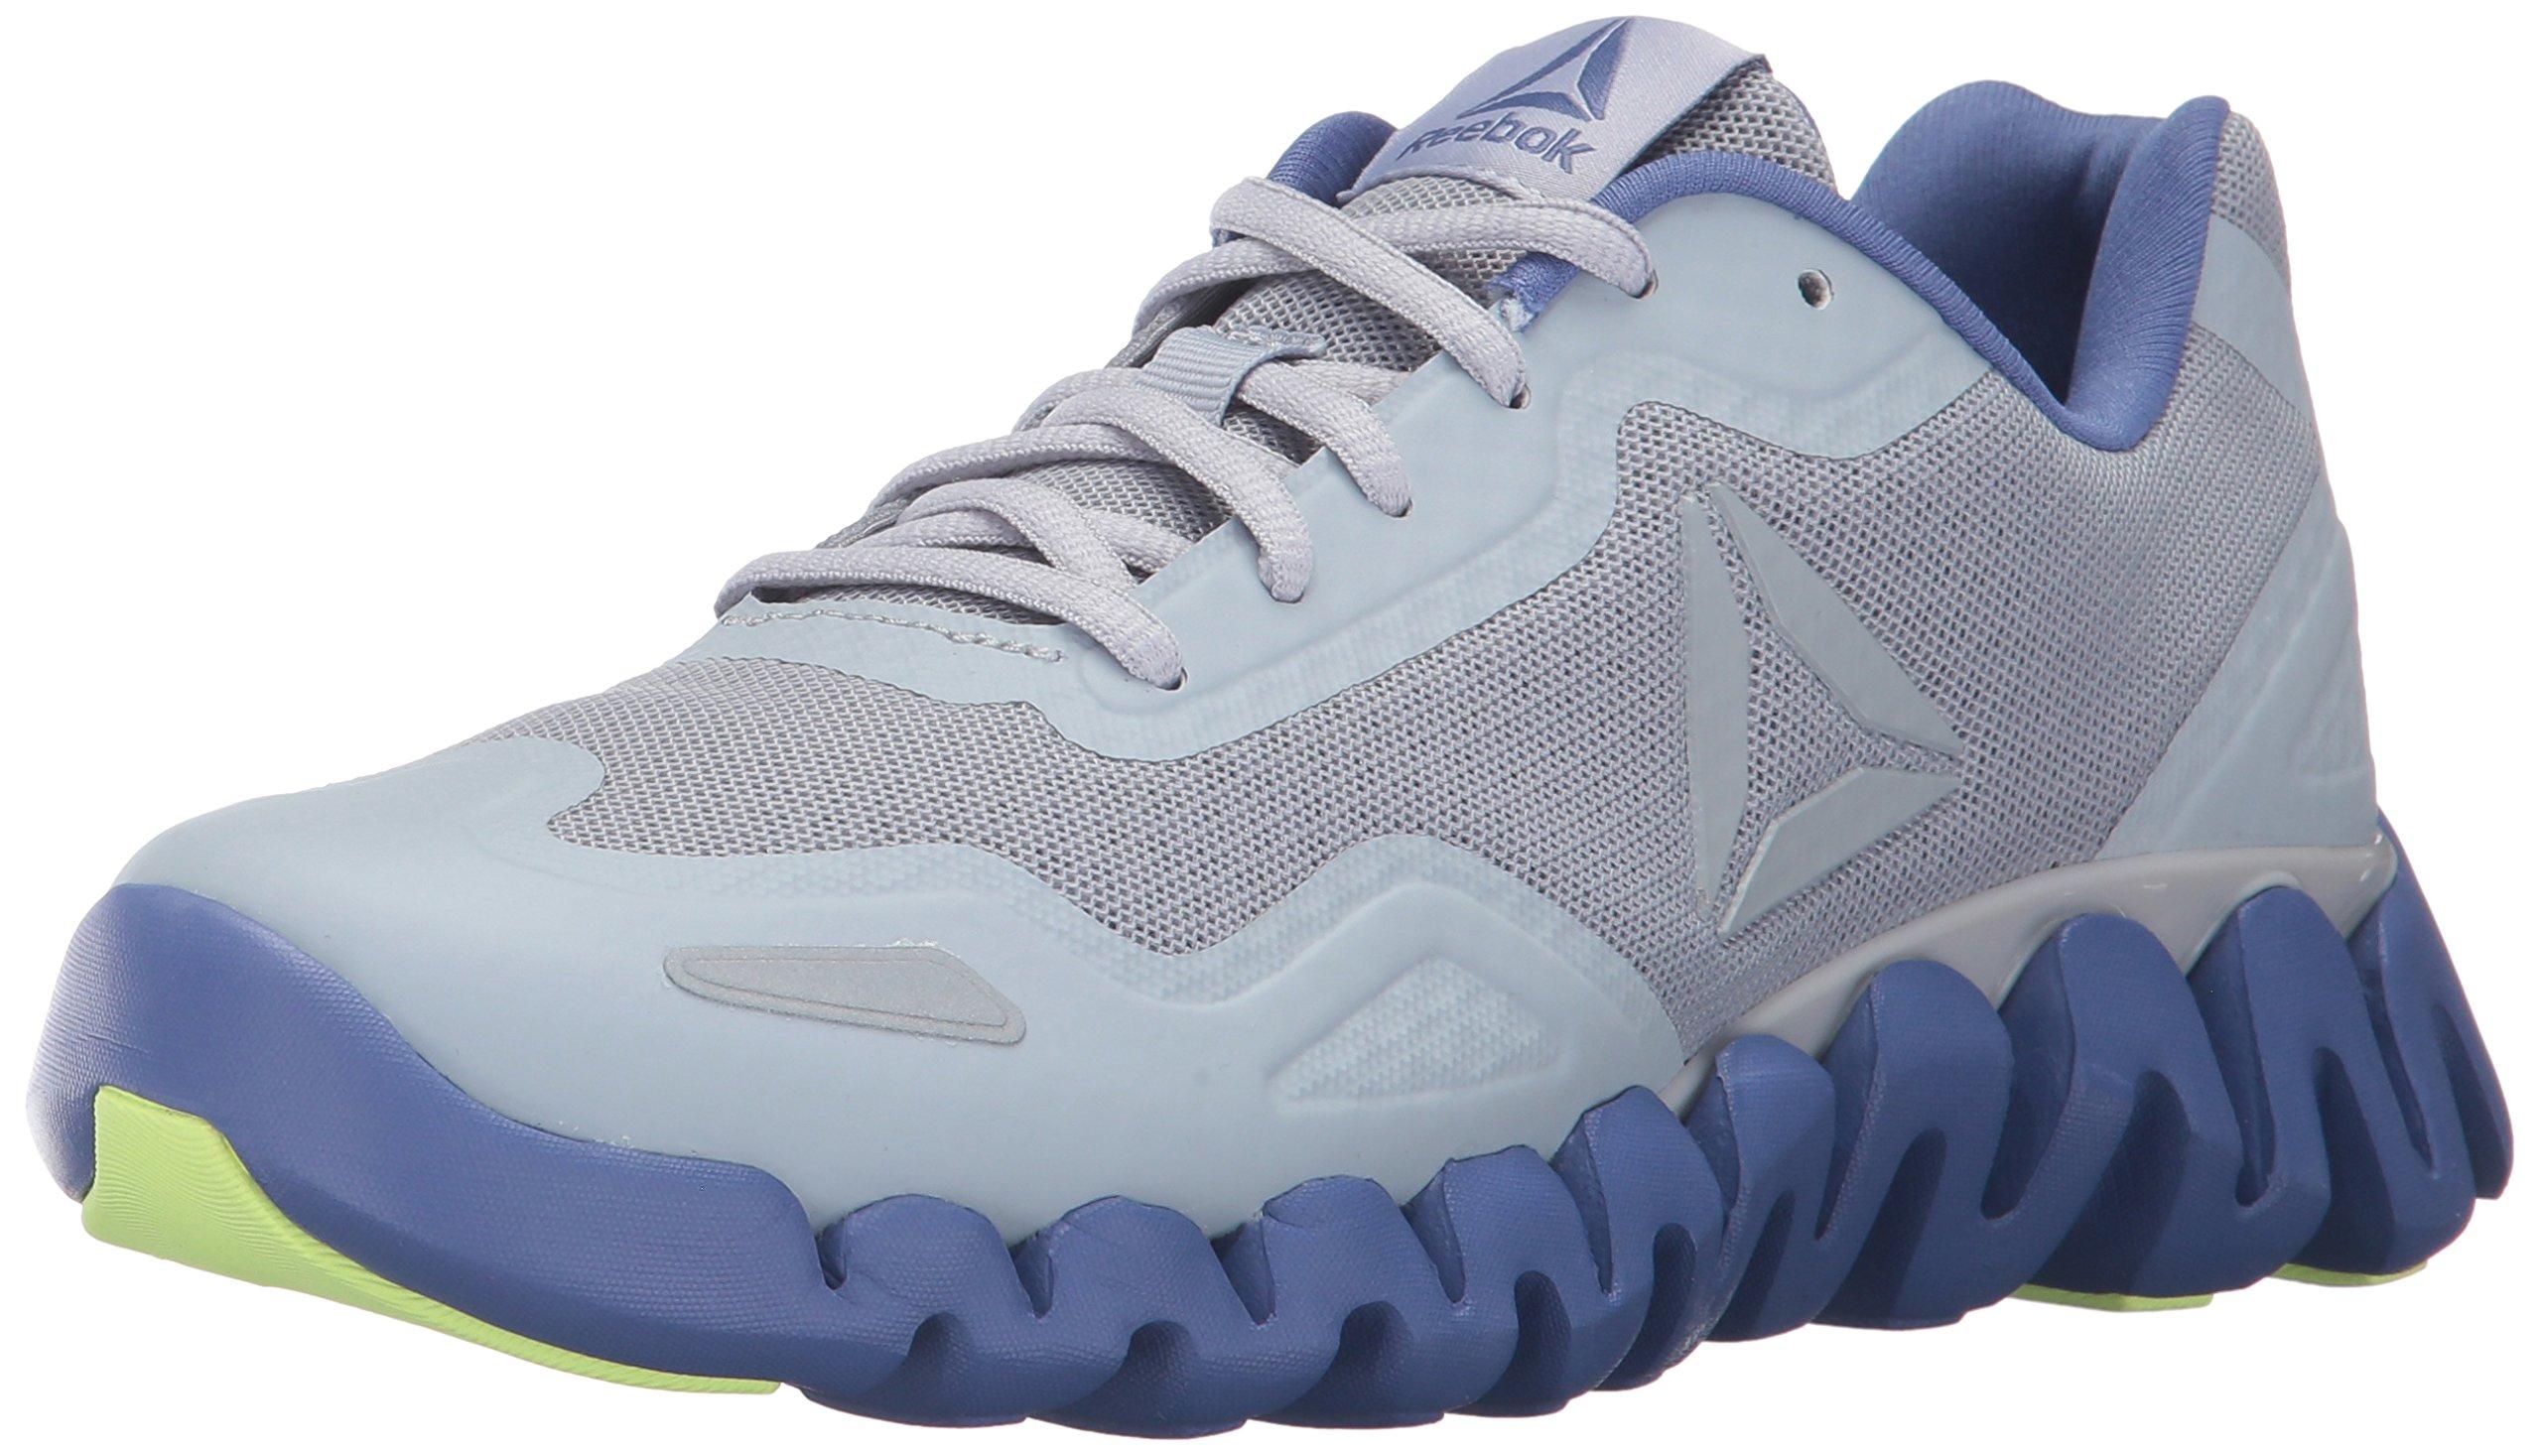 Reebok Women's Zigpulse Track Shoe, Cloud Grey/Lilac Shadow/Electric Flash, 7.5 M US,Cloud Grey/Lilac Shadow/Electric Flash,7.5 M US